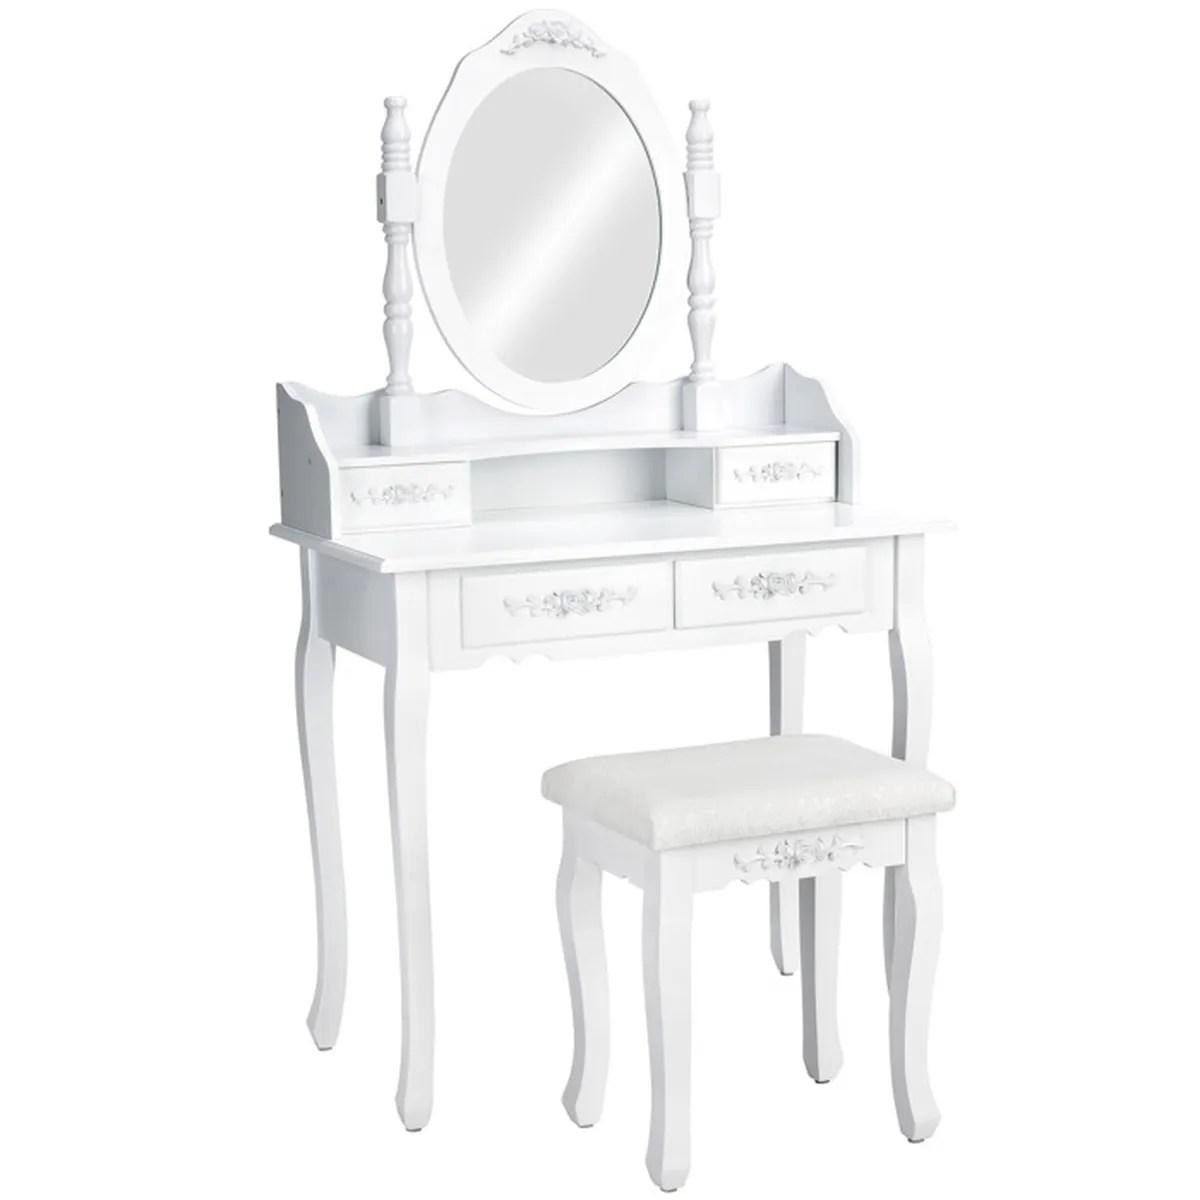 Coiffeuse Meuble Table De Maquillage Secrtaire Commode